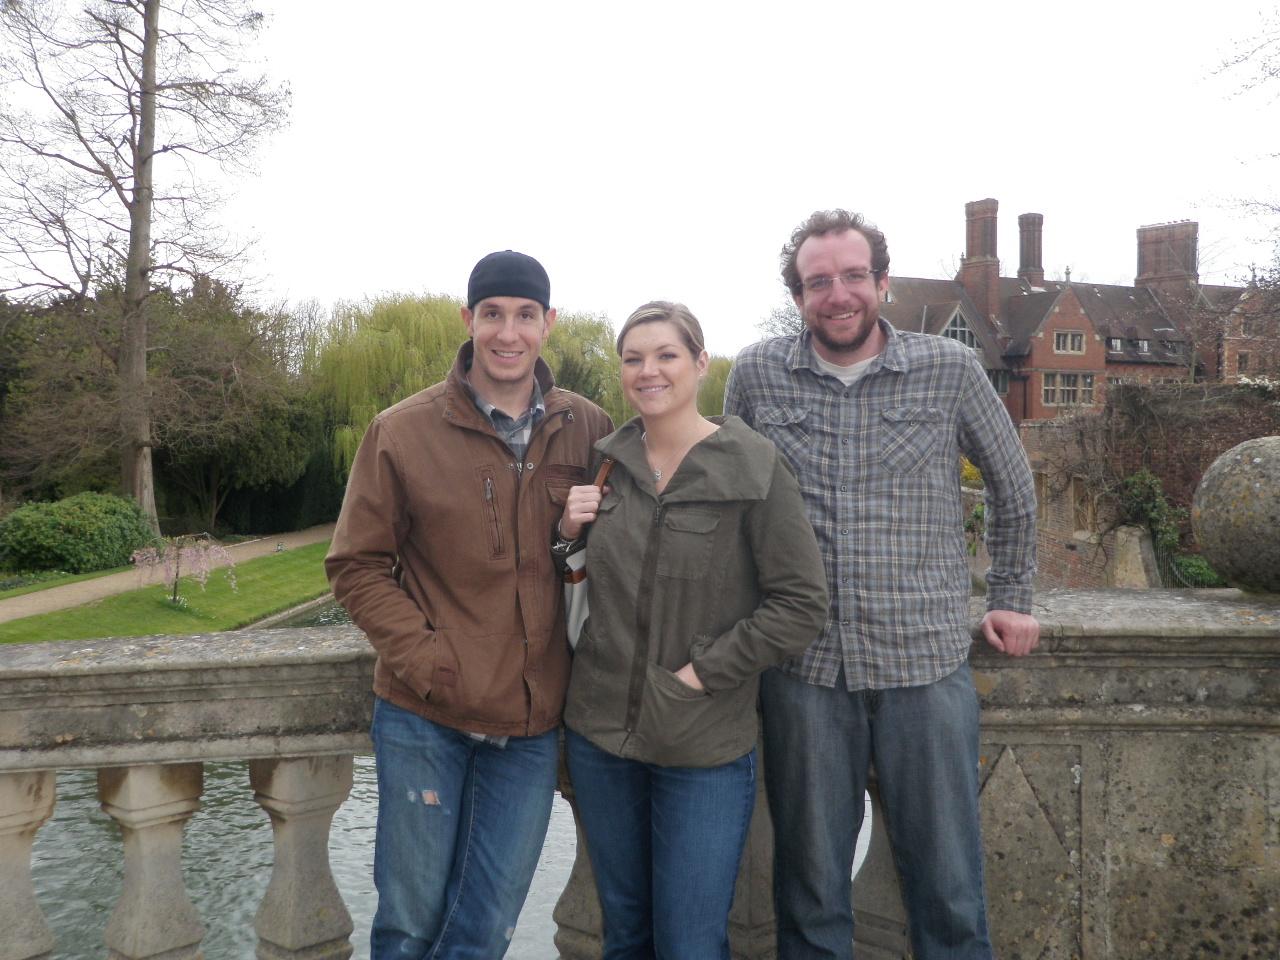 Eliot, Kristine and Jachin